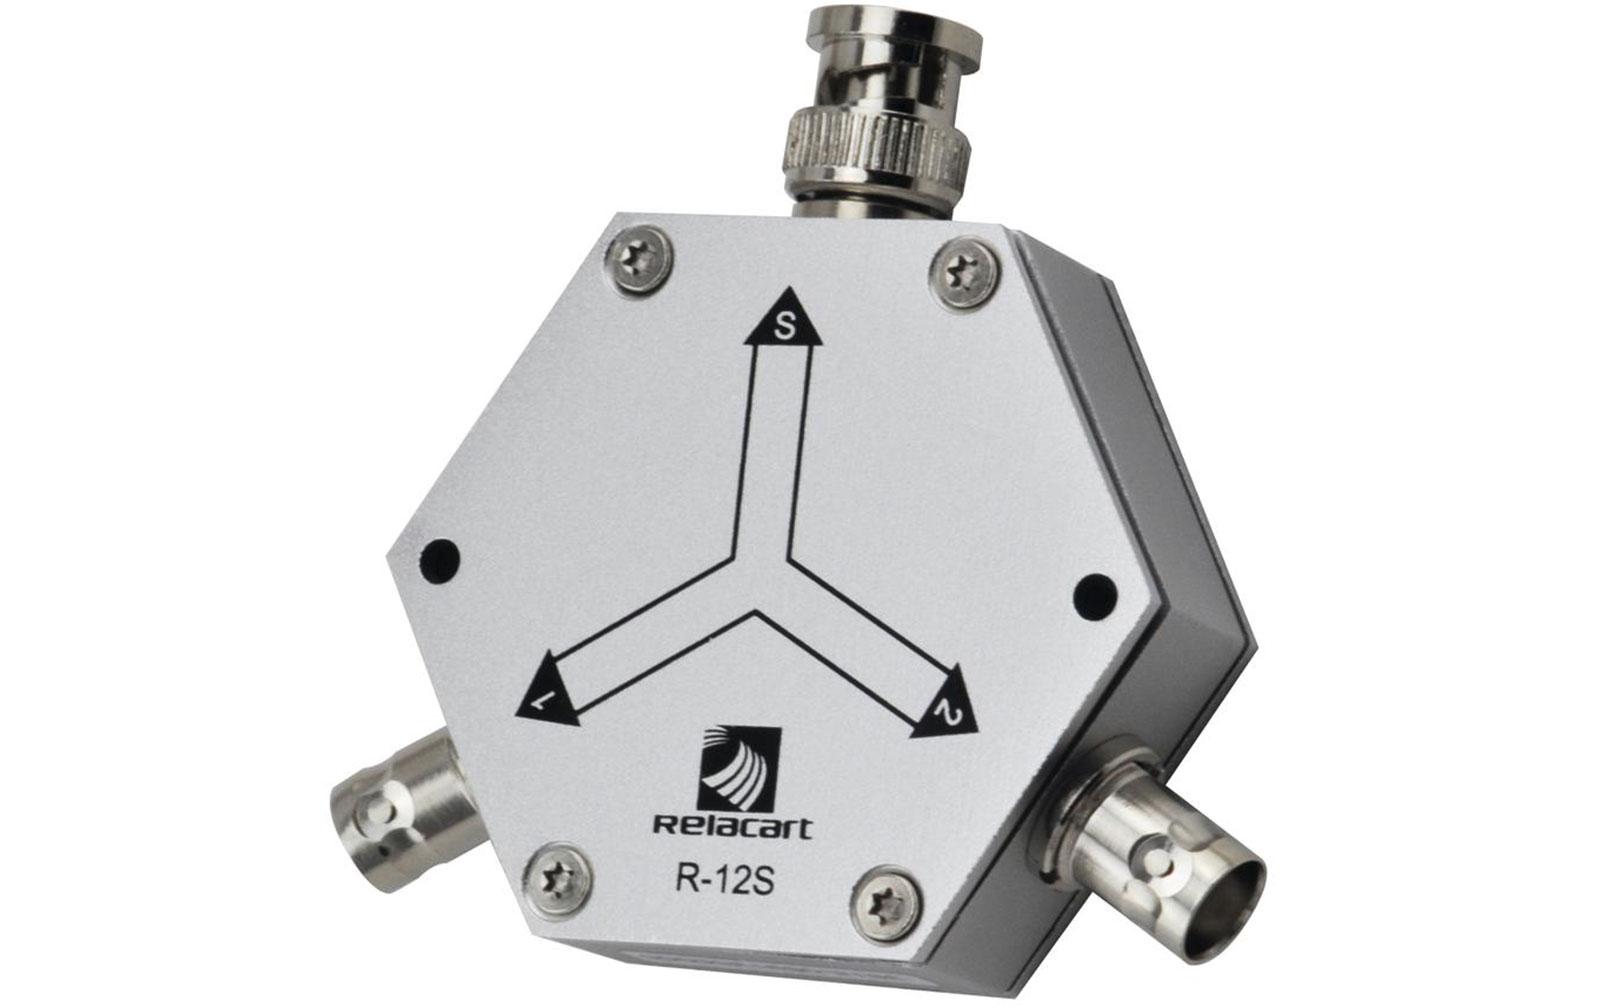 relacart-r-12s-antennenverteiler-hub